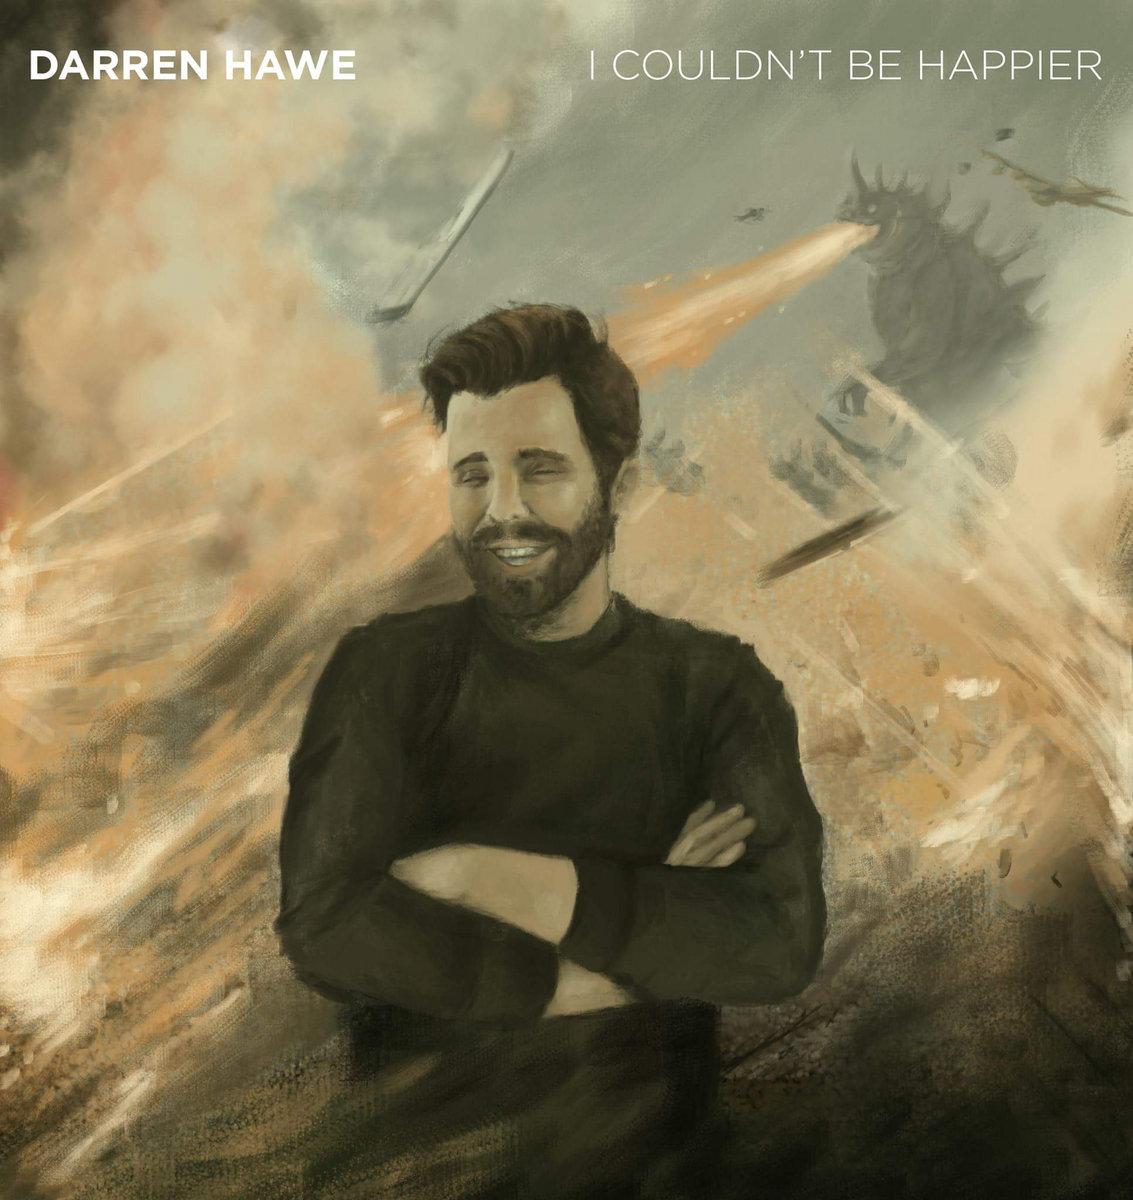 Darren whacking off alone